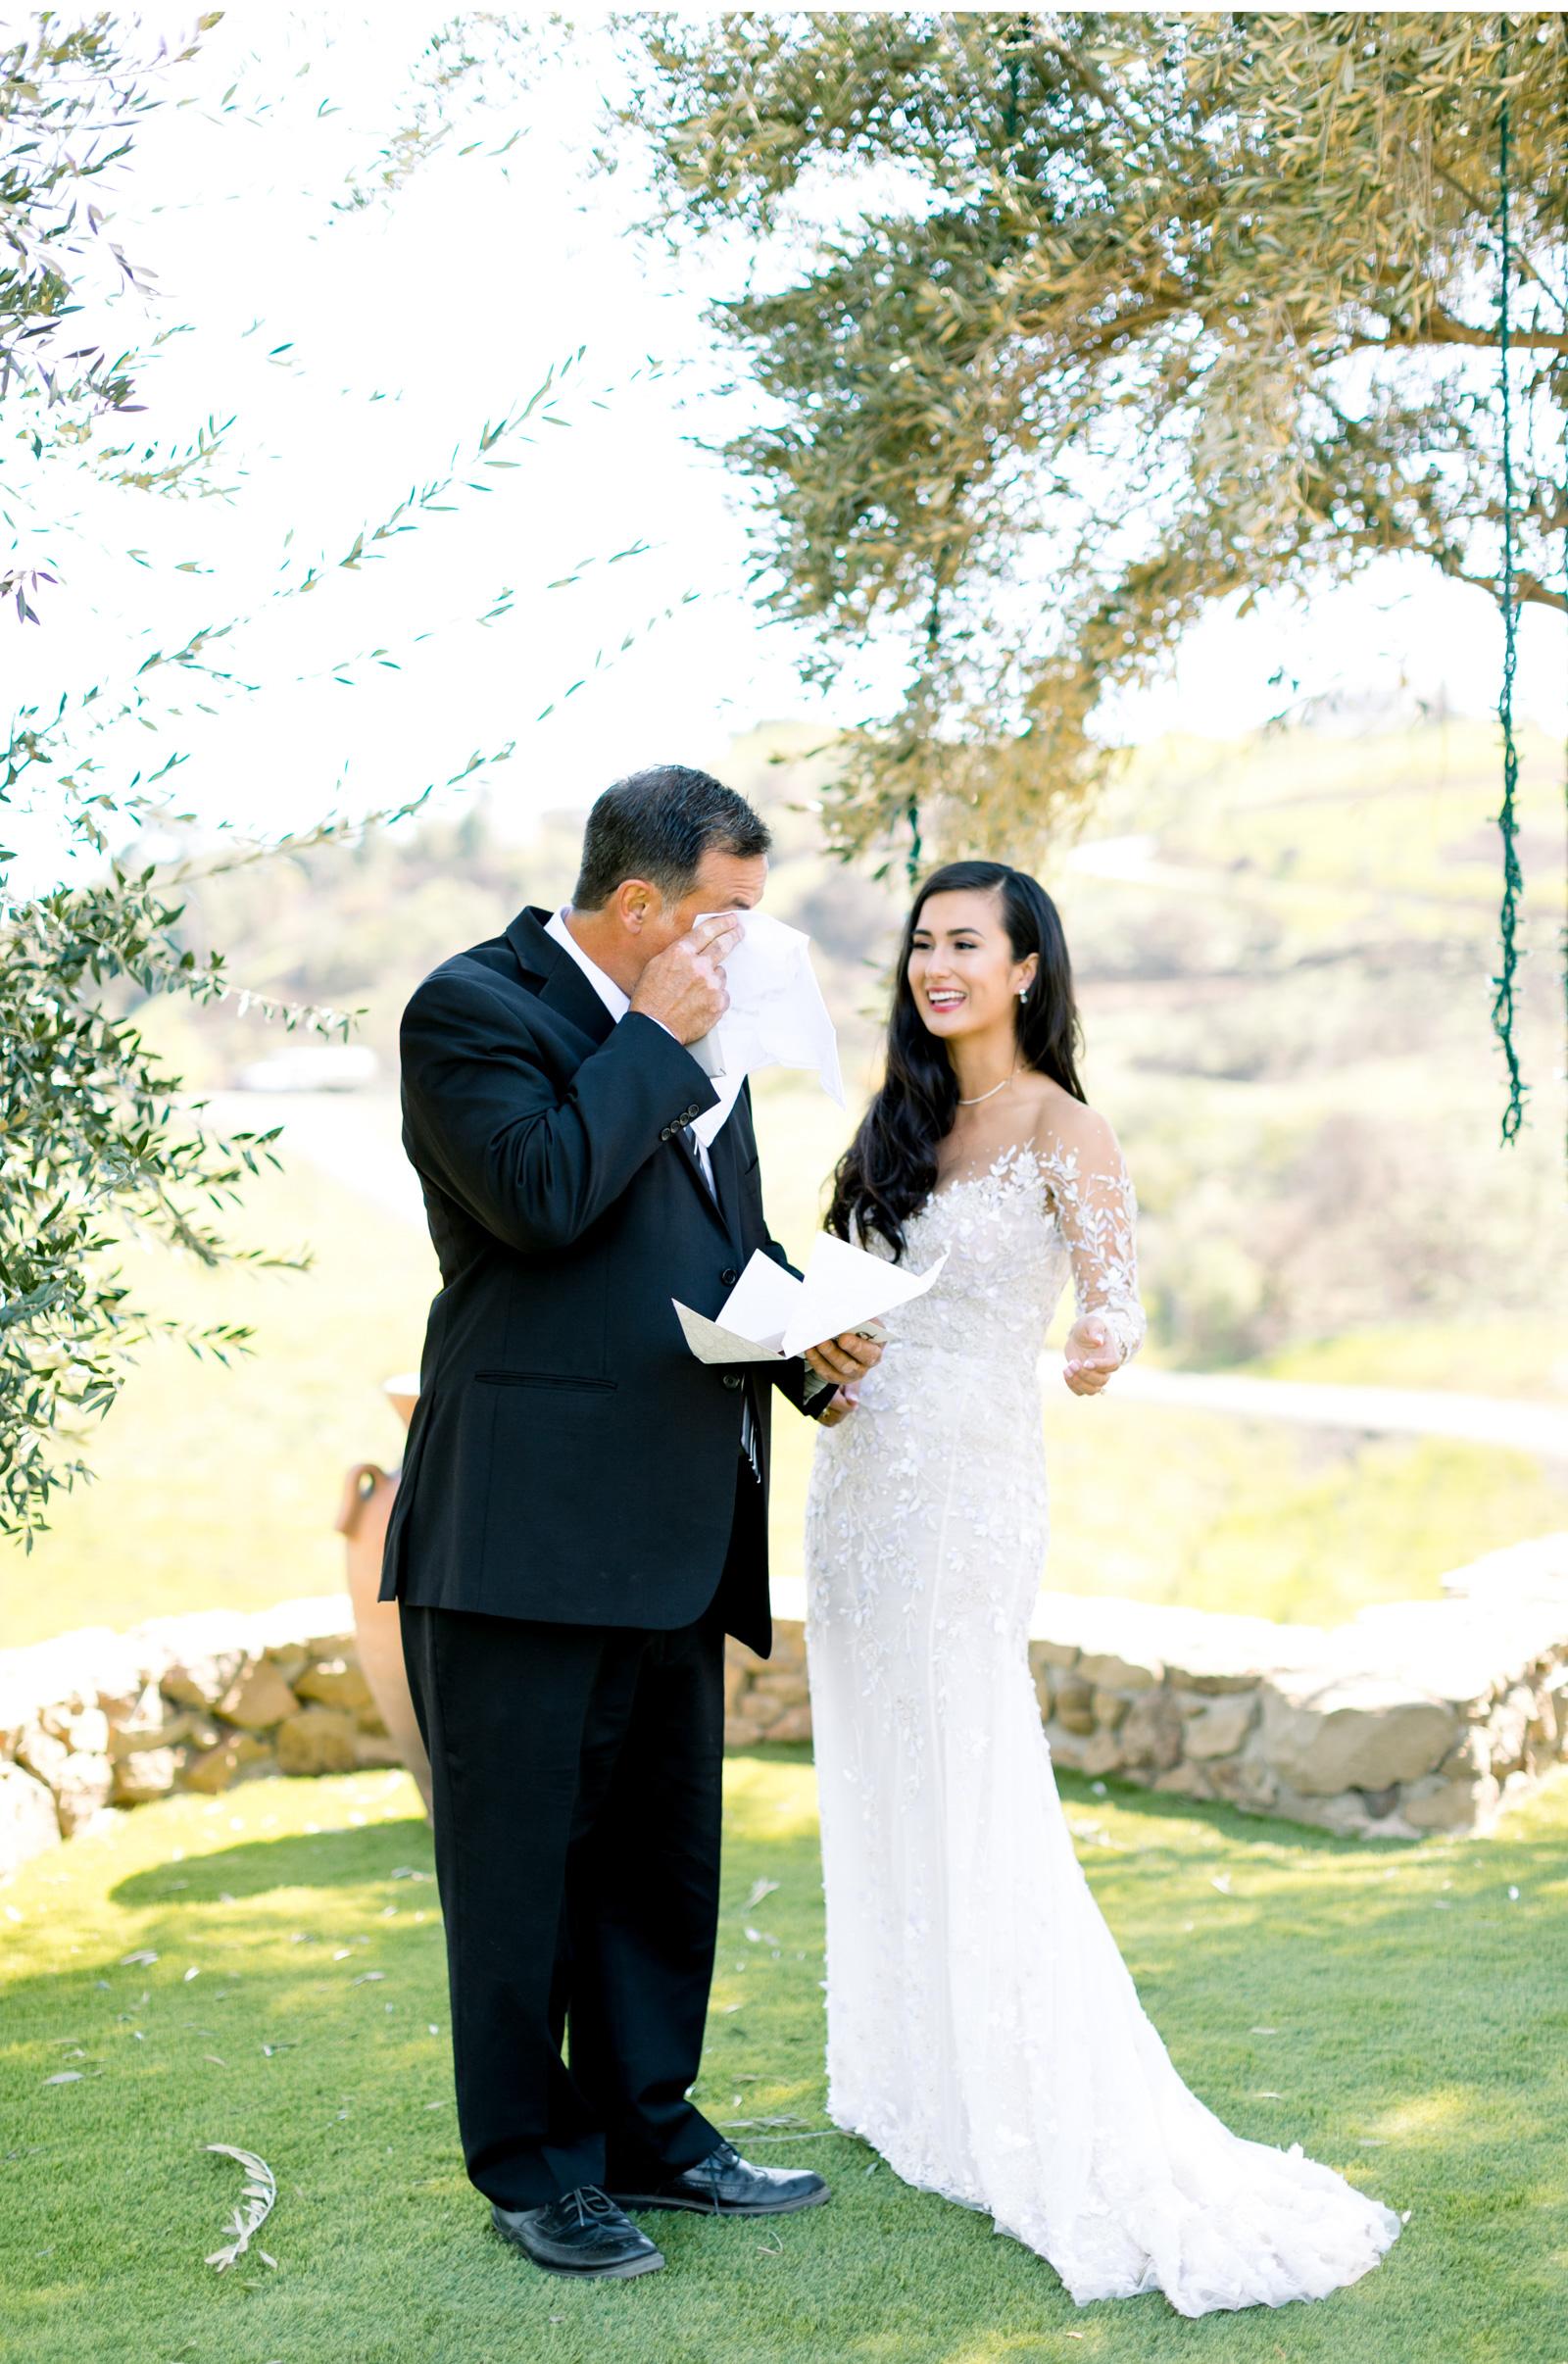 Southern-California-Wedding-Photographer-Natalie-Schutt-Photography-Style-Me-Pretty-Malibu-Rocky-Oaks-Photographer_13.jpg